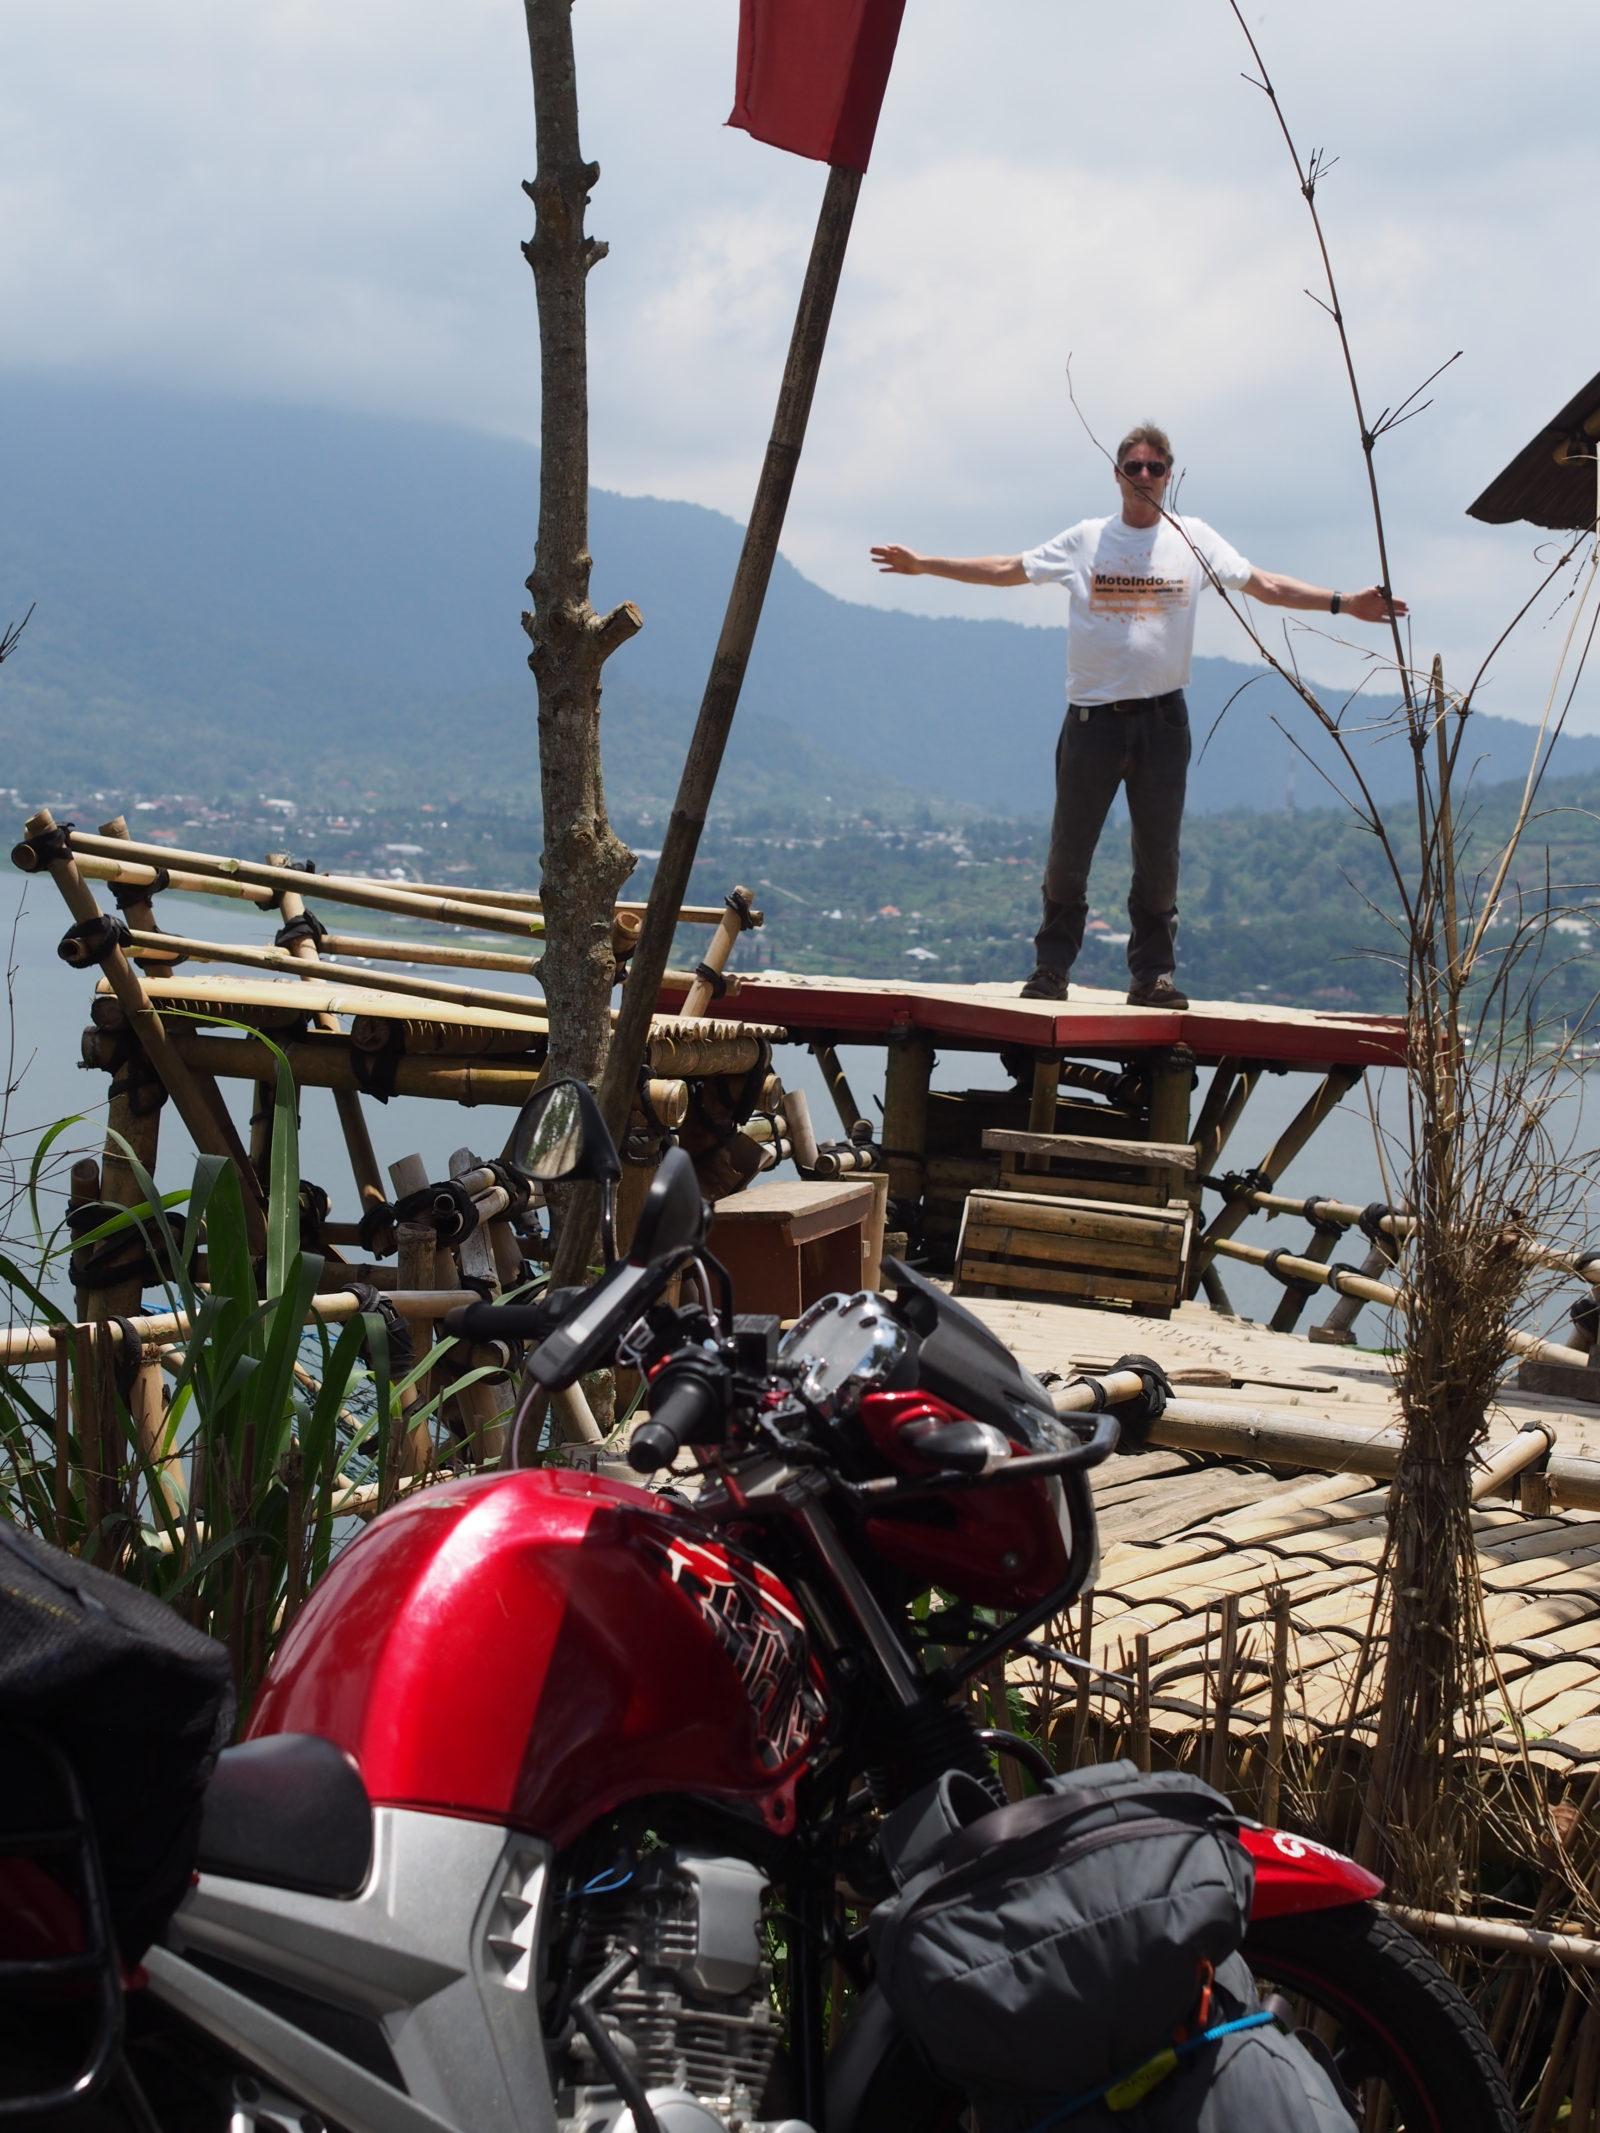 picnic ground on the way to Lovina, northern Bali